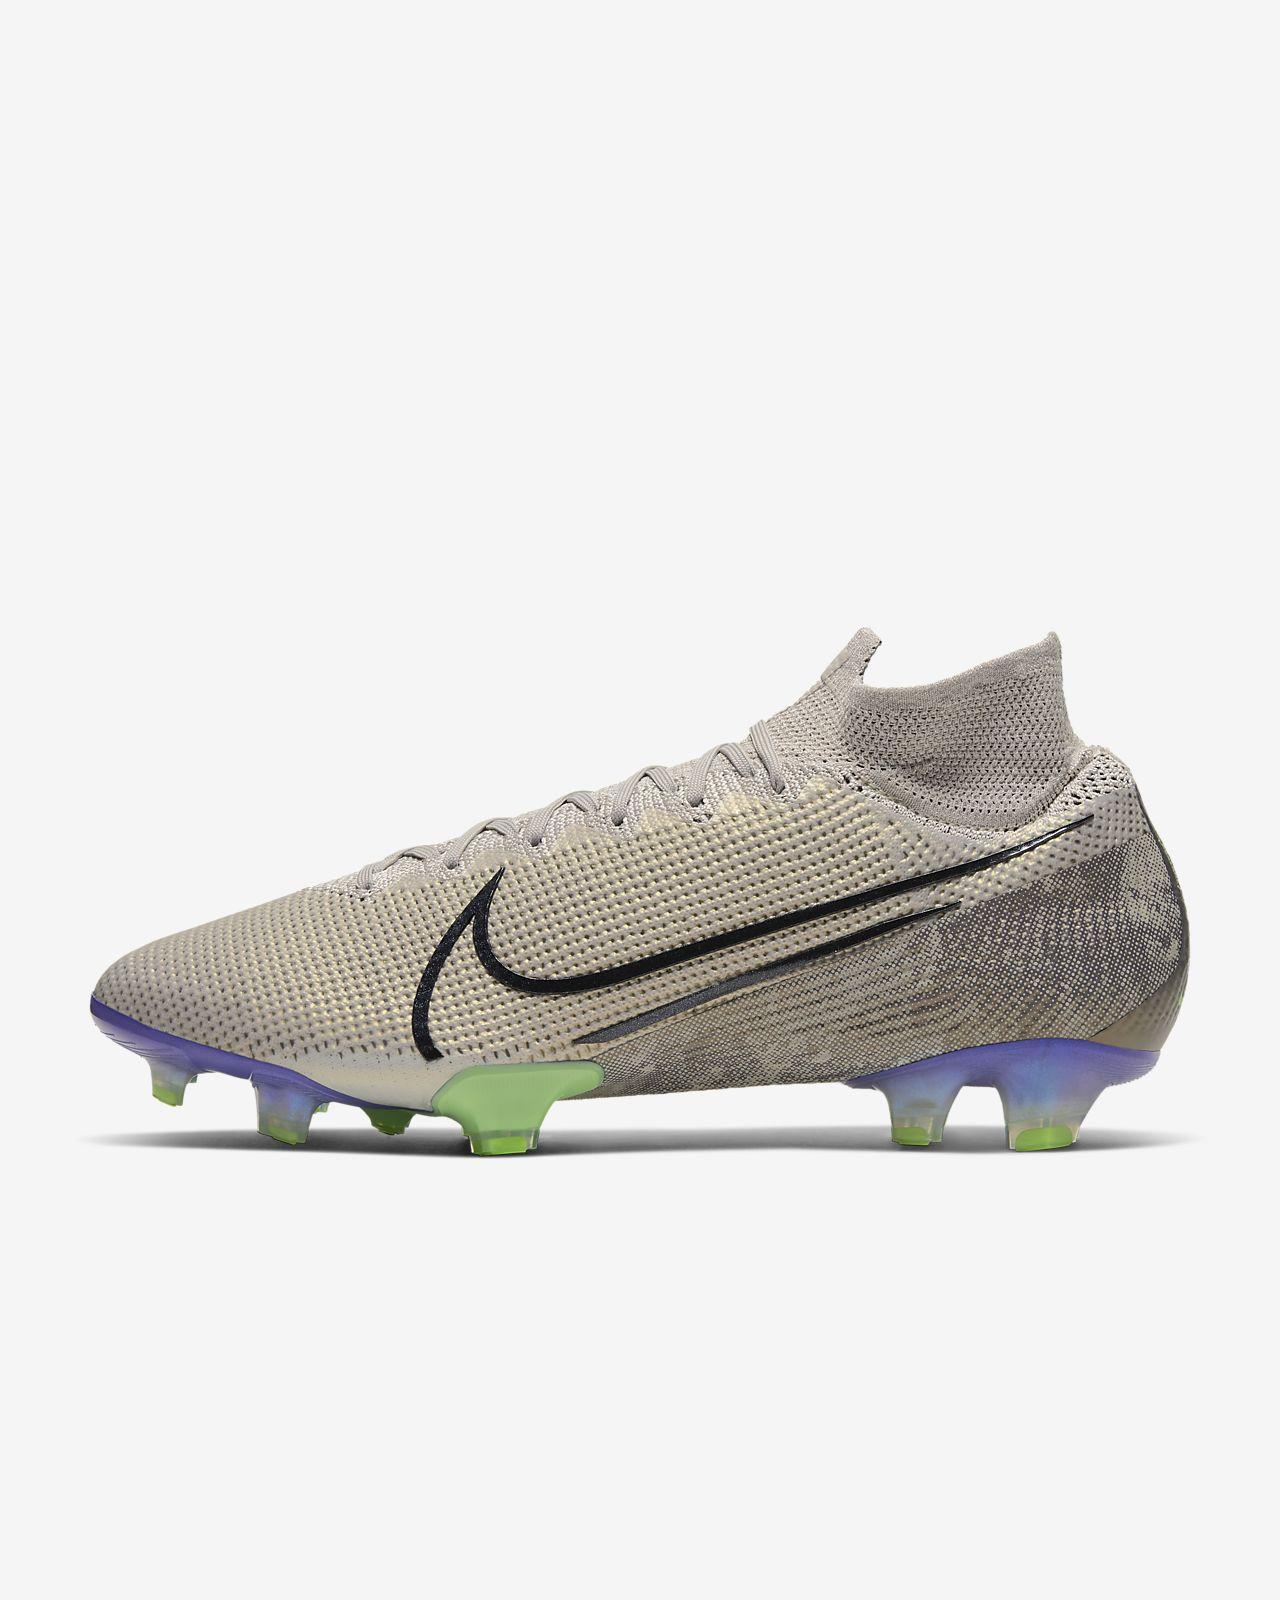 Nike FG Superfly Mercurial 7 Elite Rasen normalen für Fußballschuh O0wX8nPkN